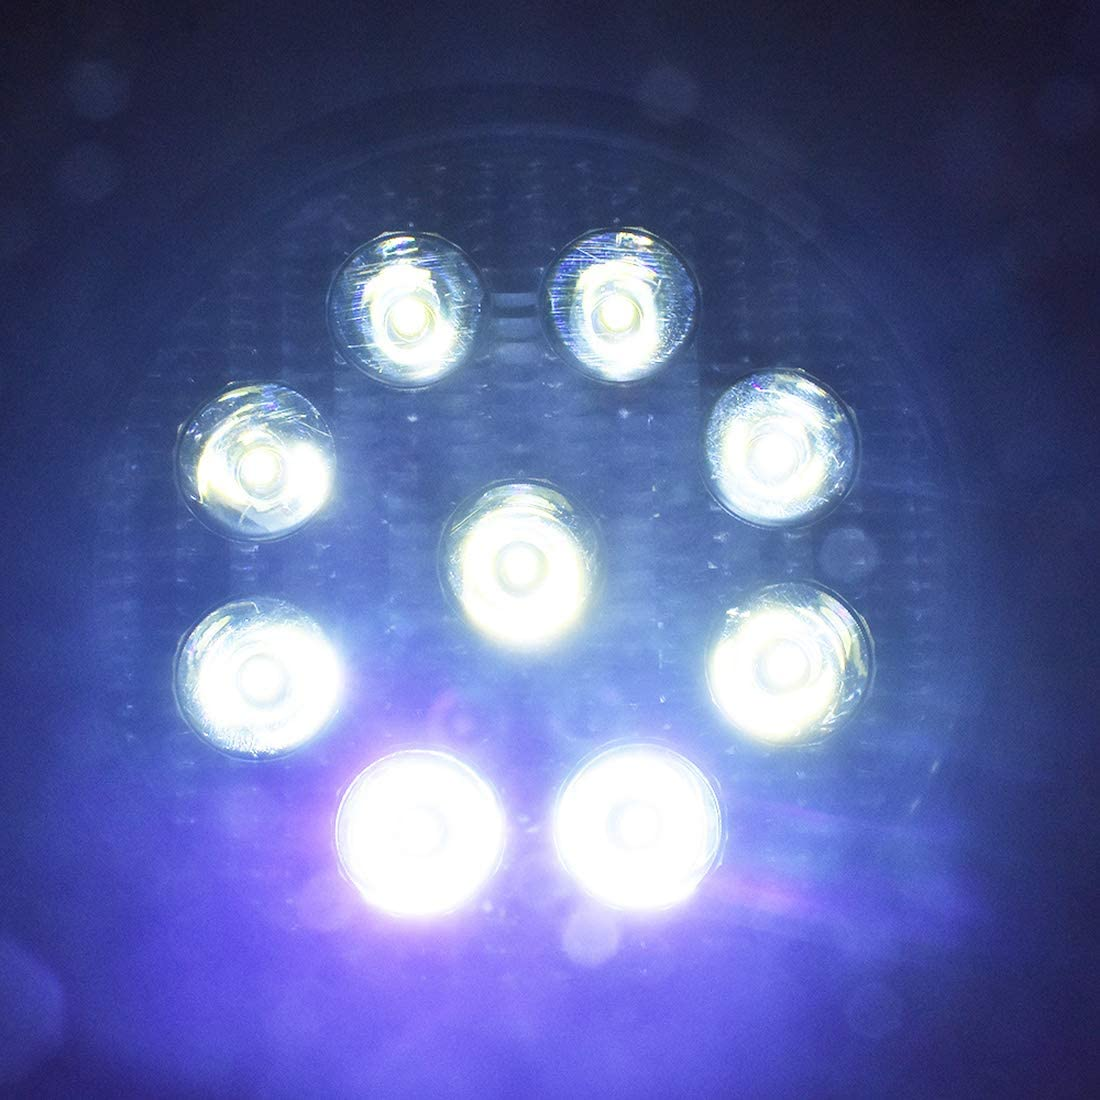 WFLNHB LED Light Bar 20PCS 4Inch 27W Round LED Work Light LED Pod Lights Flood Beam Offroad Driving Lights Fog Light Waterproof Fit for Truck Car ATV SUV Boat 4WD ATV 12V